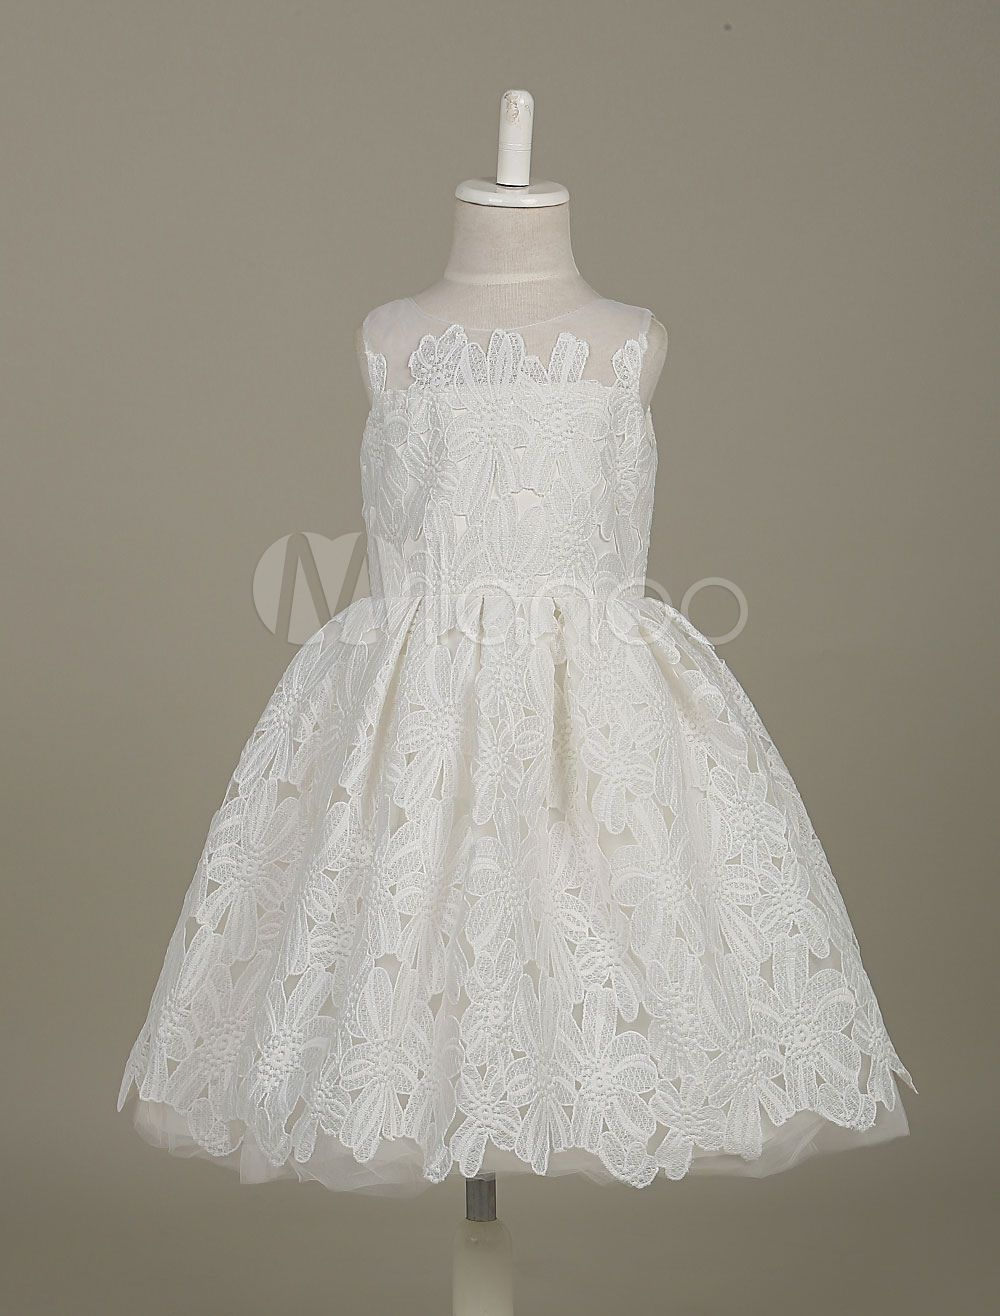 Flower girl dresses white lace tutu dress sleeveless pleated tulle